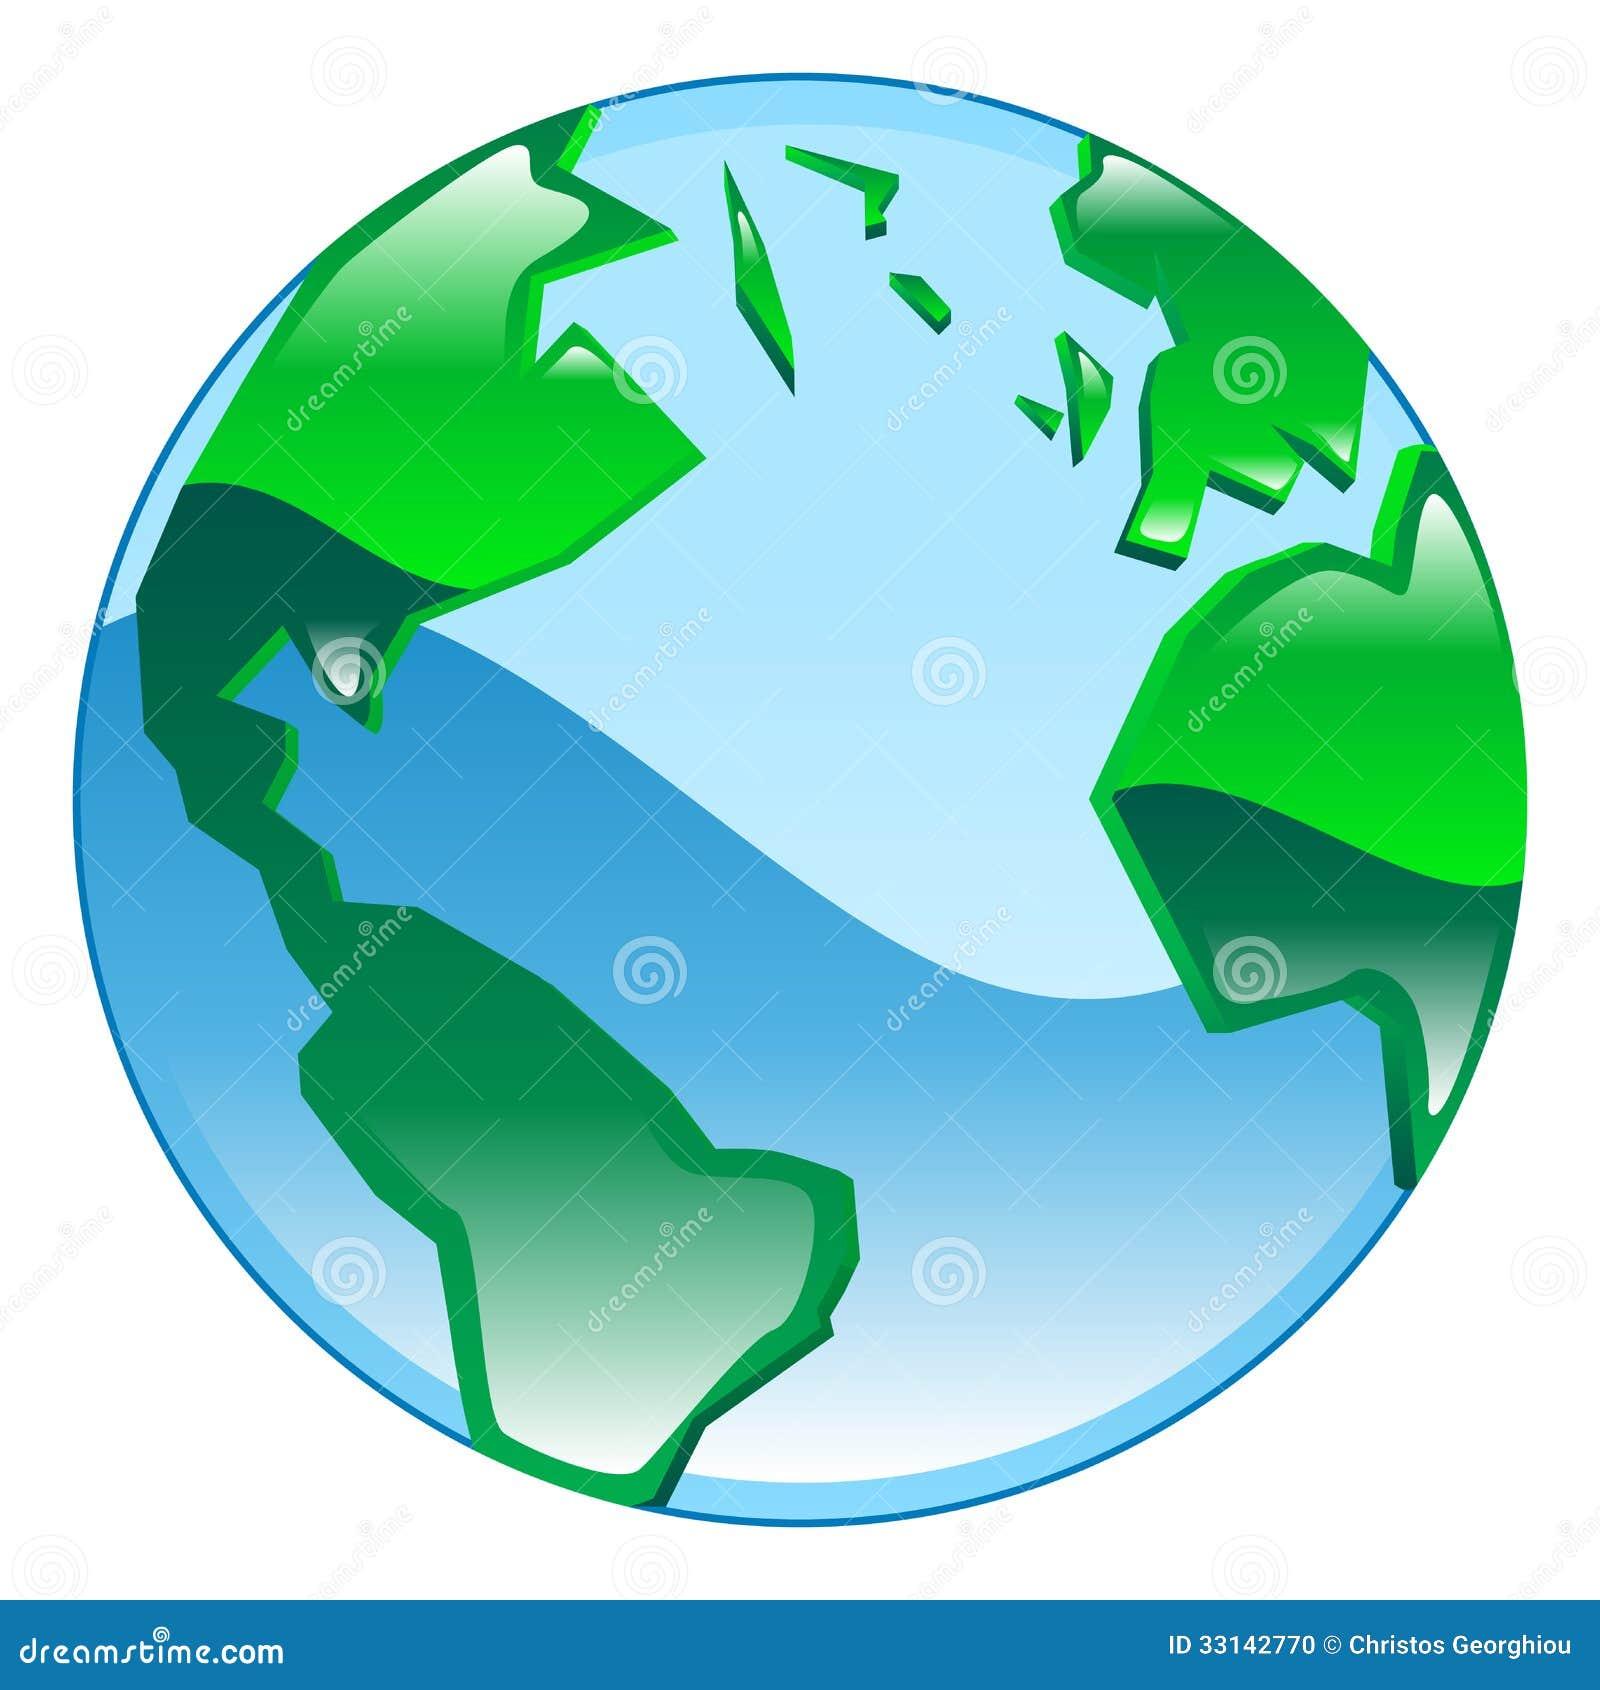 Globe Icon Clipart Illustration Stock Vector Image 33142770